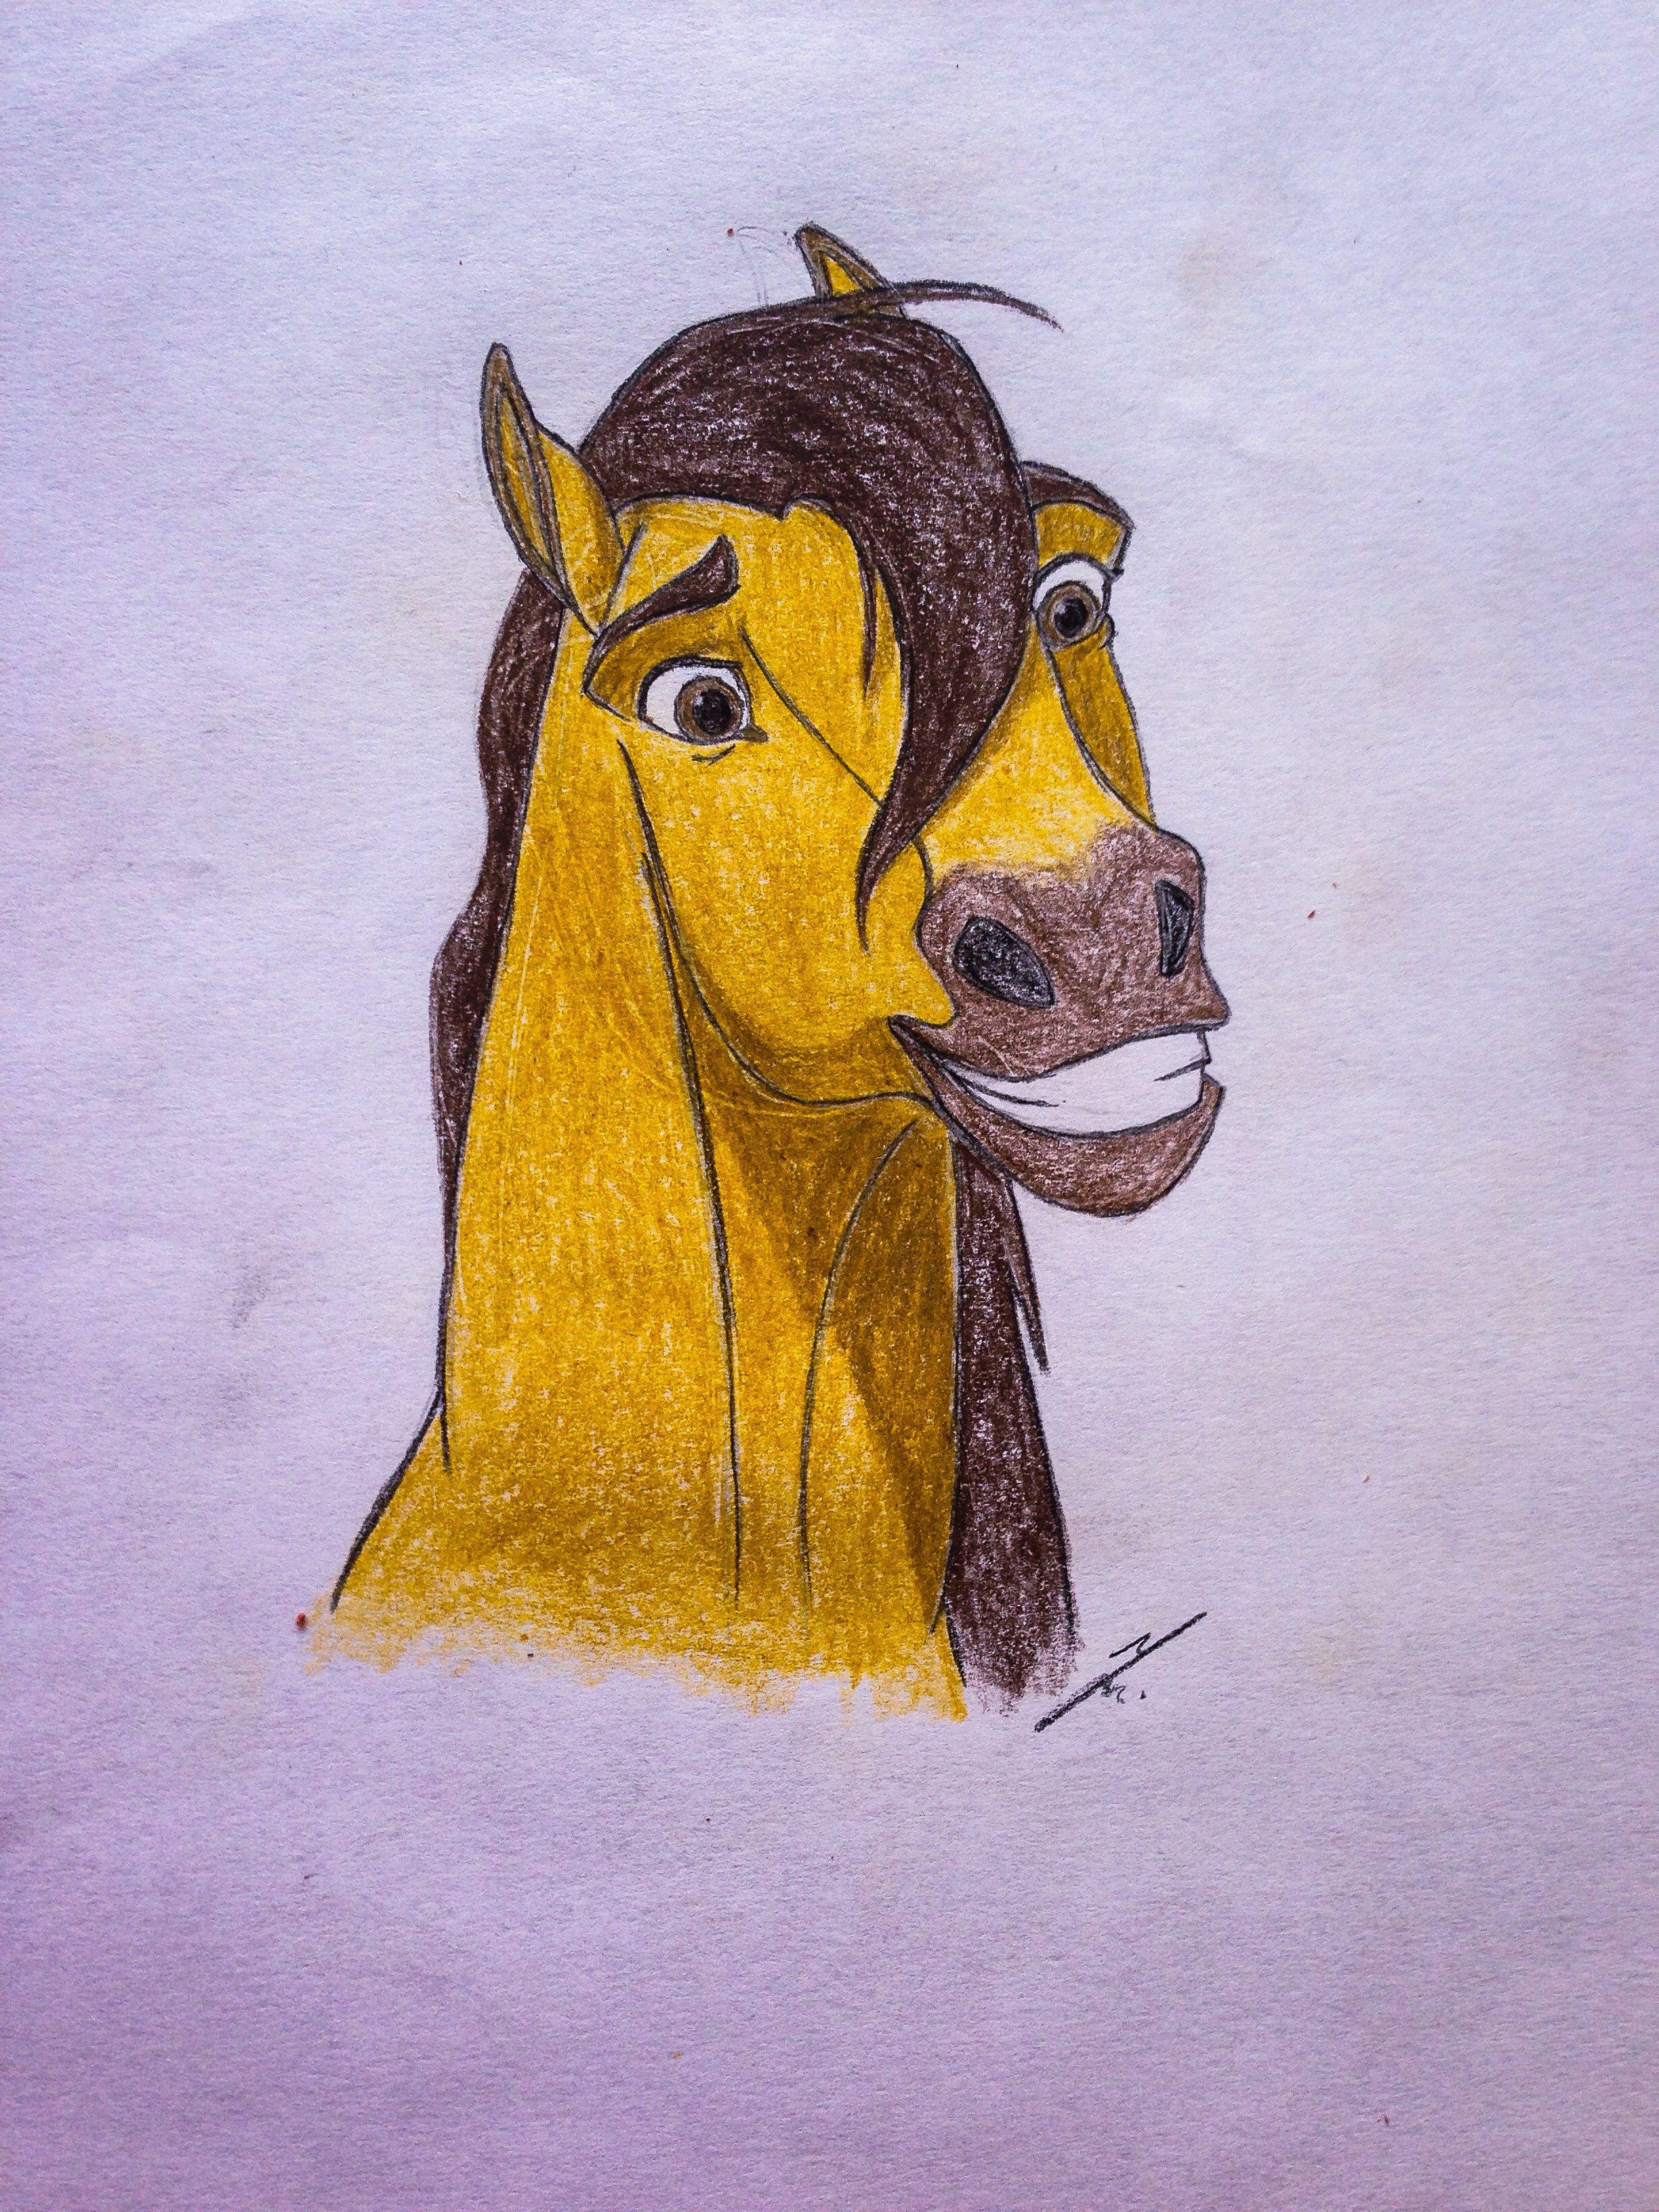 2448x3264 Spirit The Stallion Of Cimarron Spirit Drawings